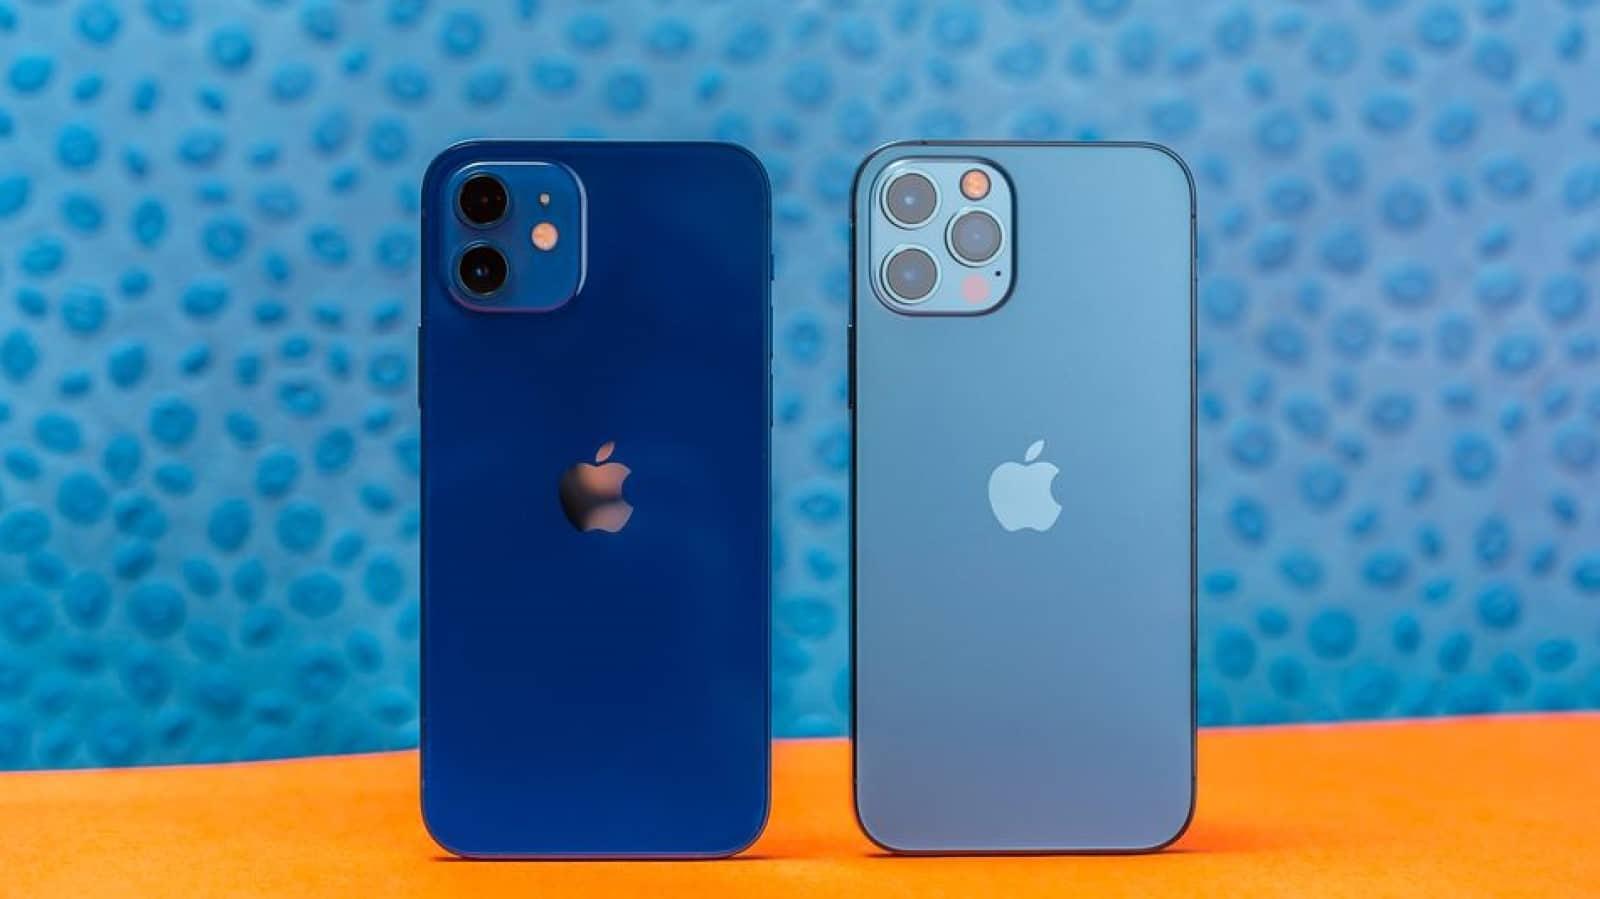 mashable iphone 12 and iphone 12 pro